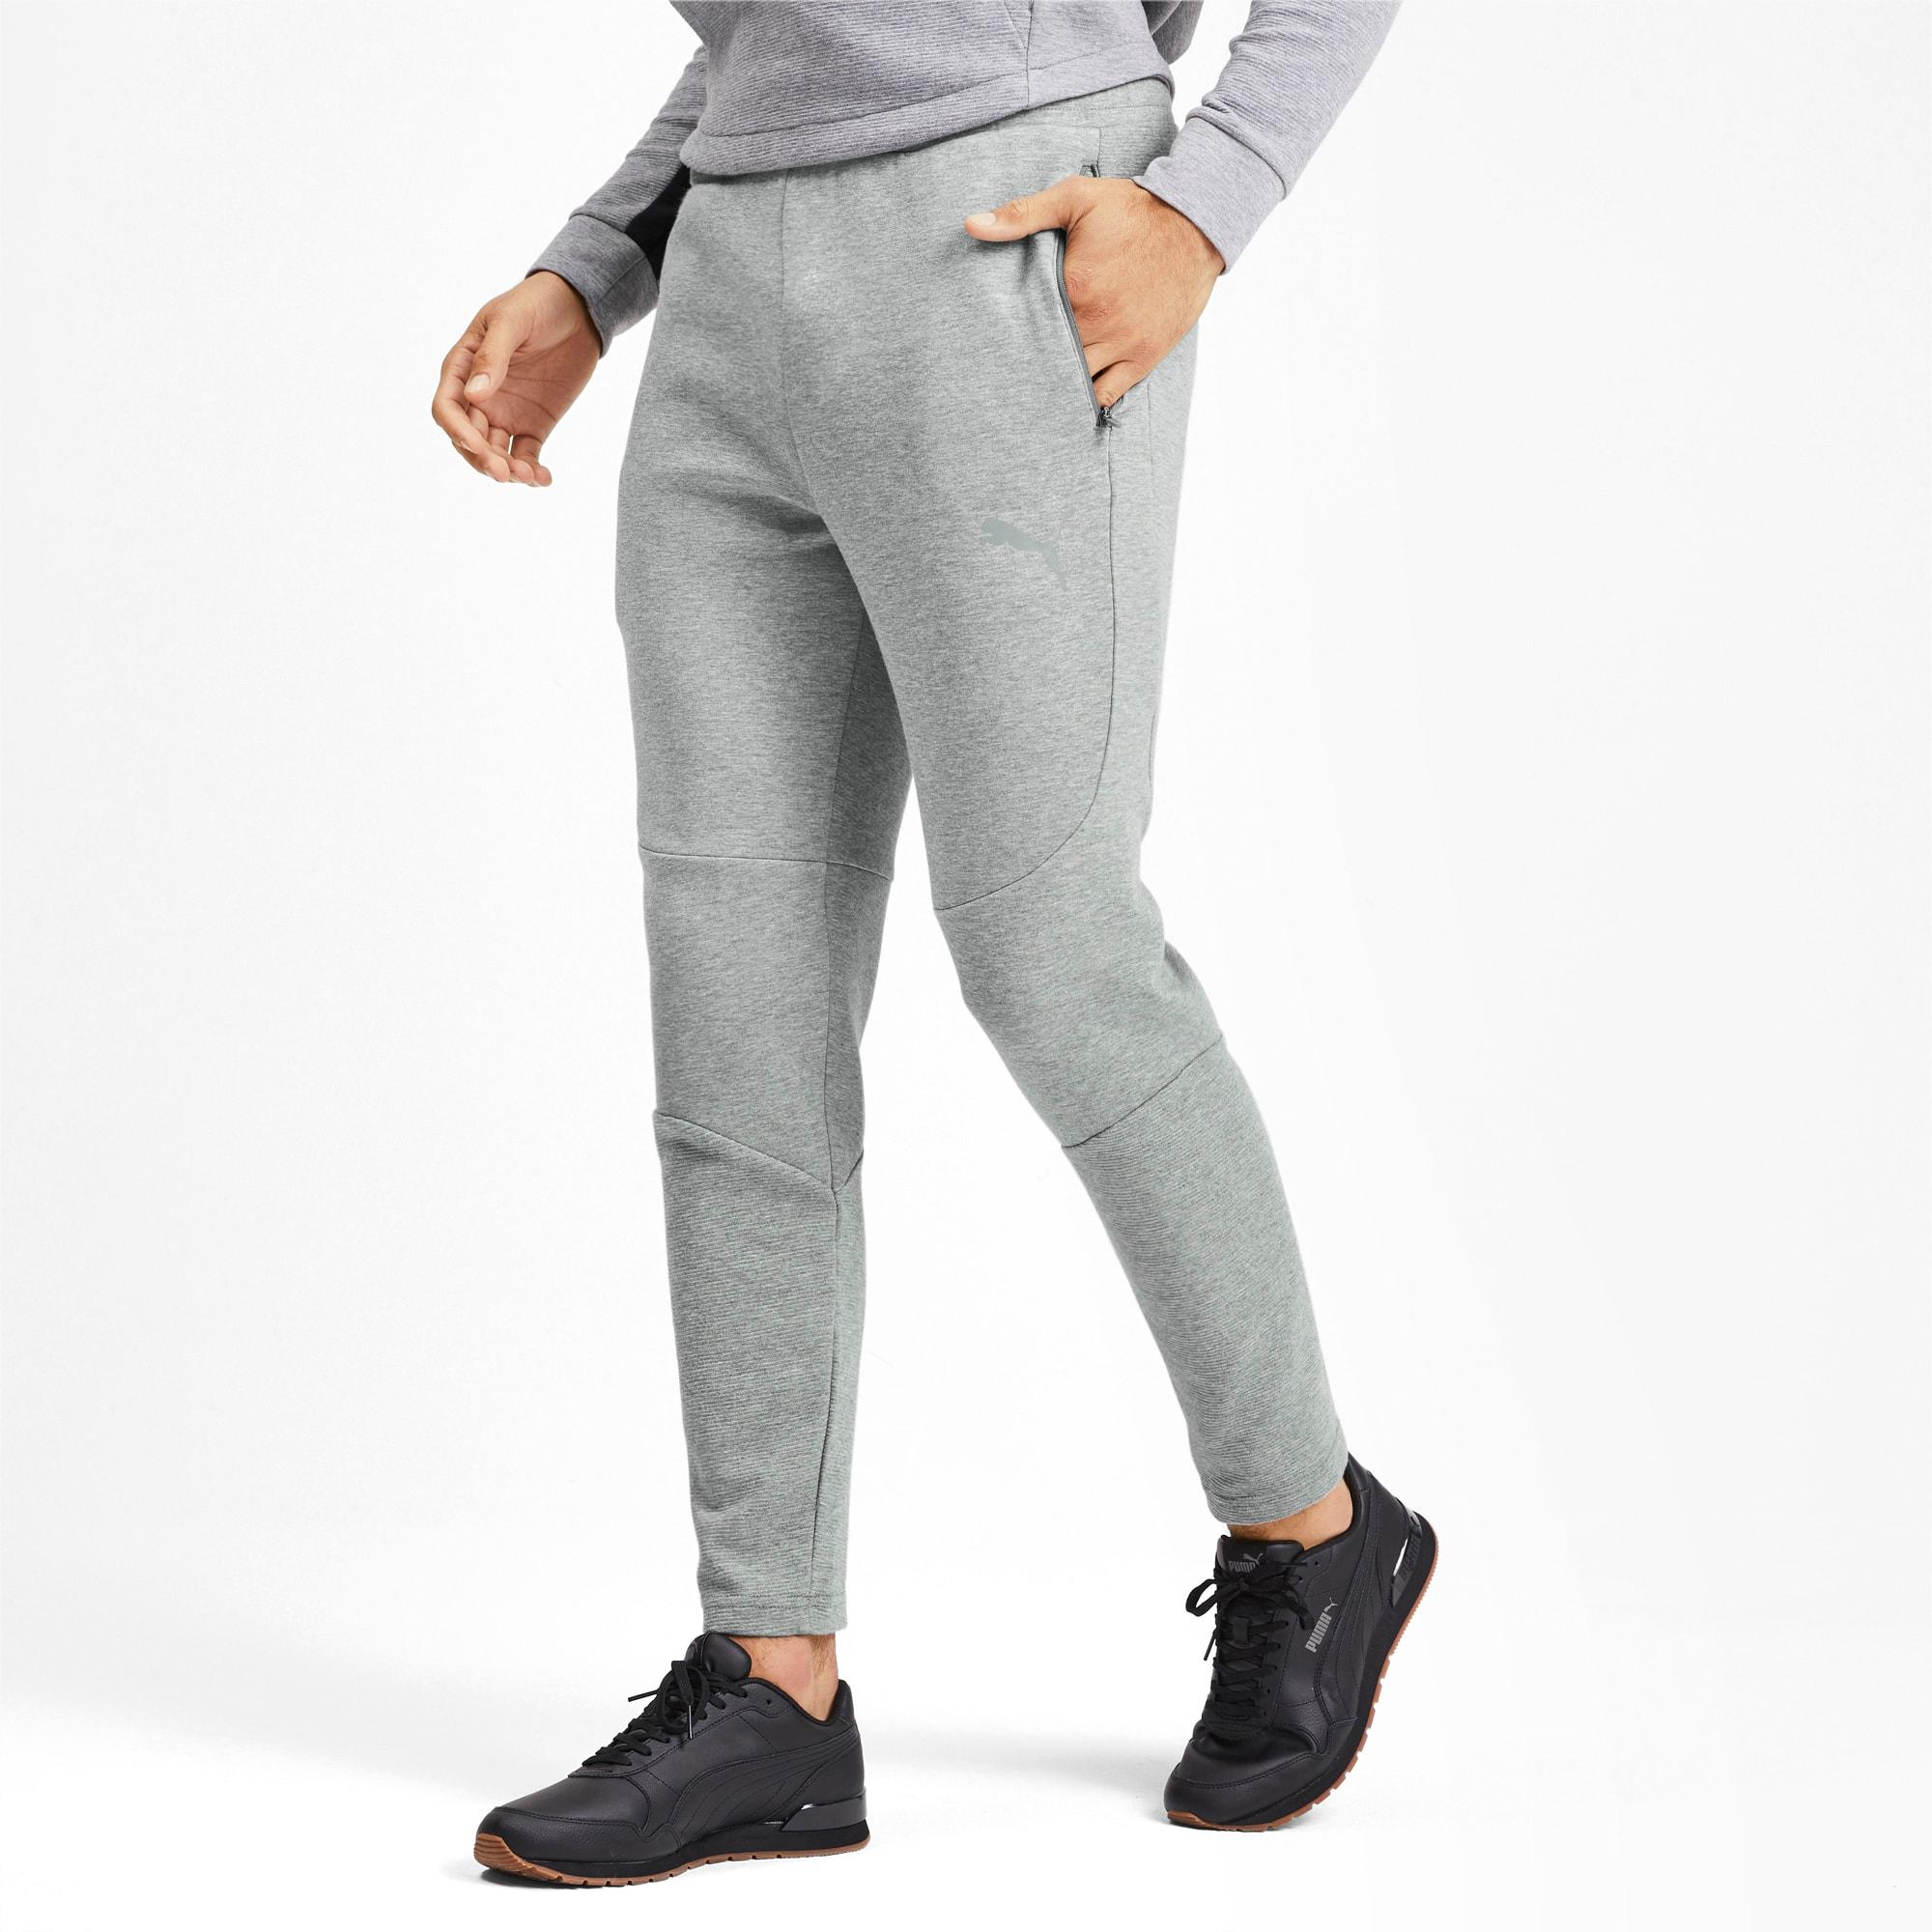 Puma Evostripe spodnie damskie, xl